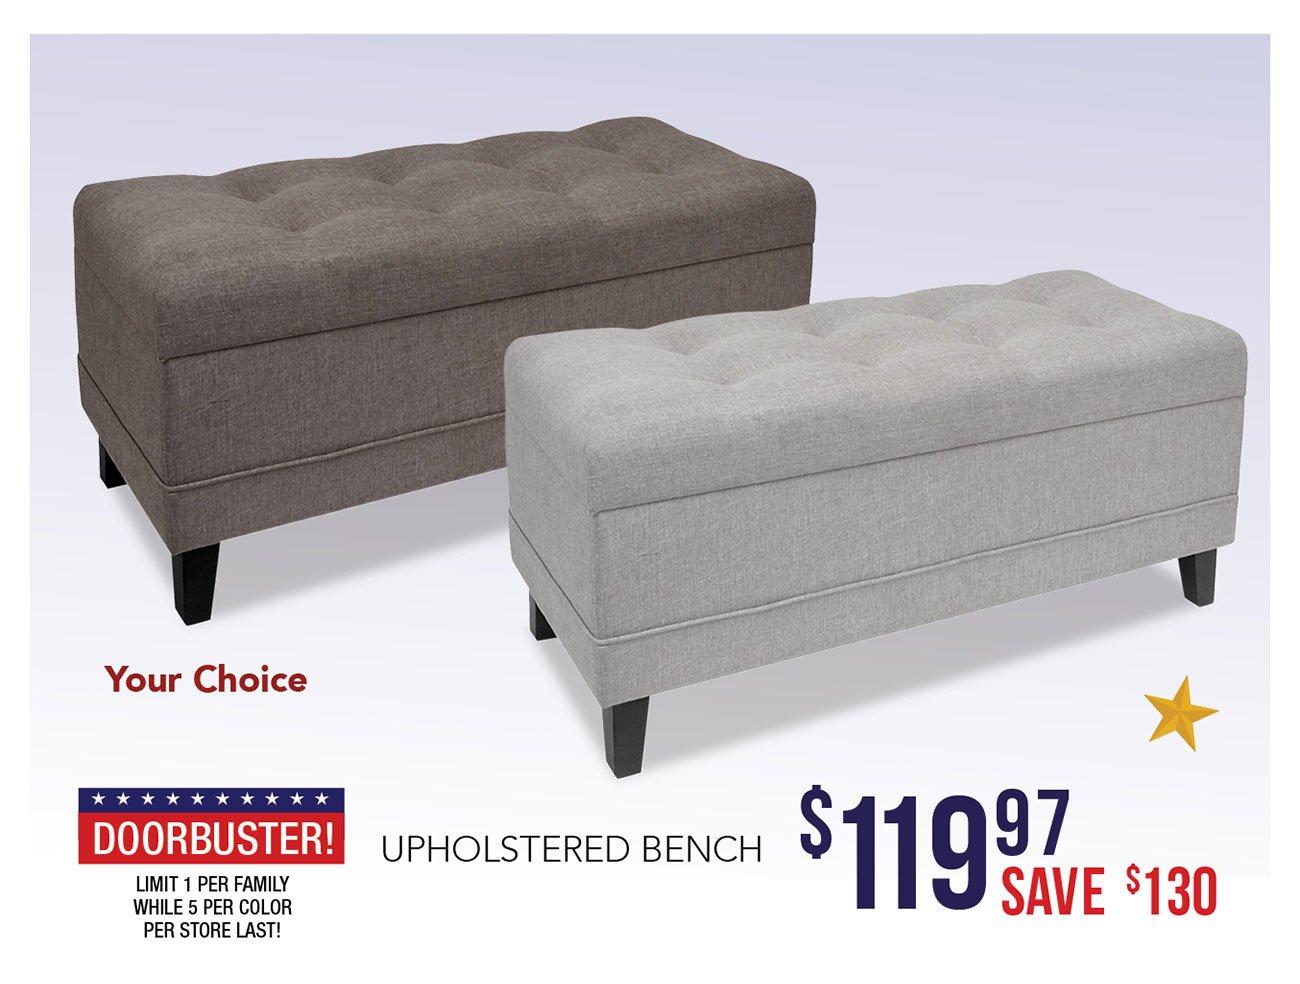 Upholstered-bench